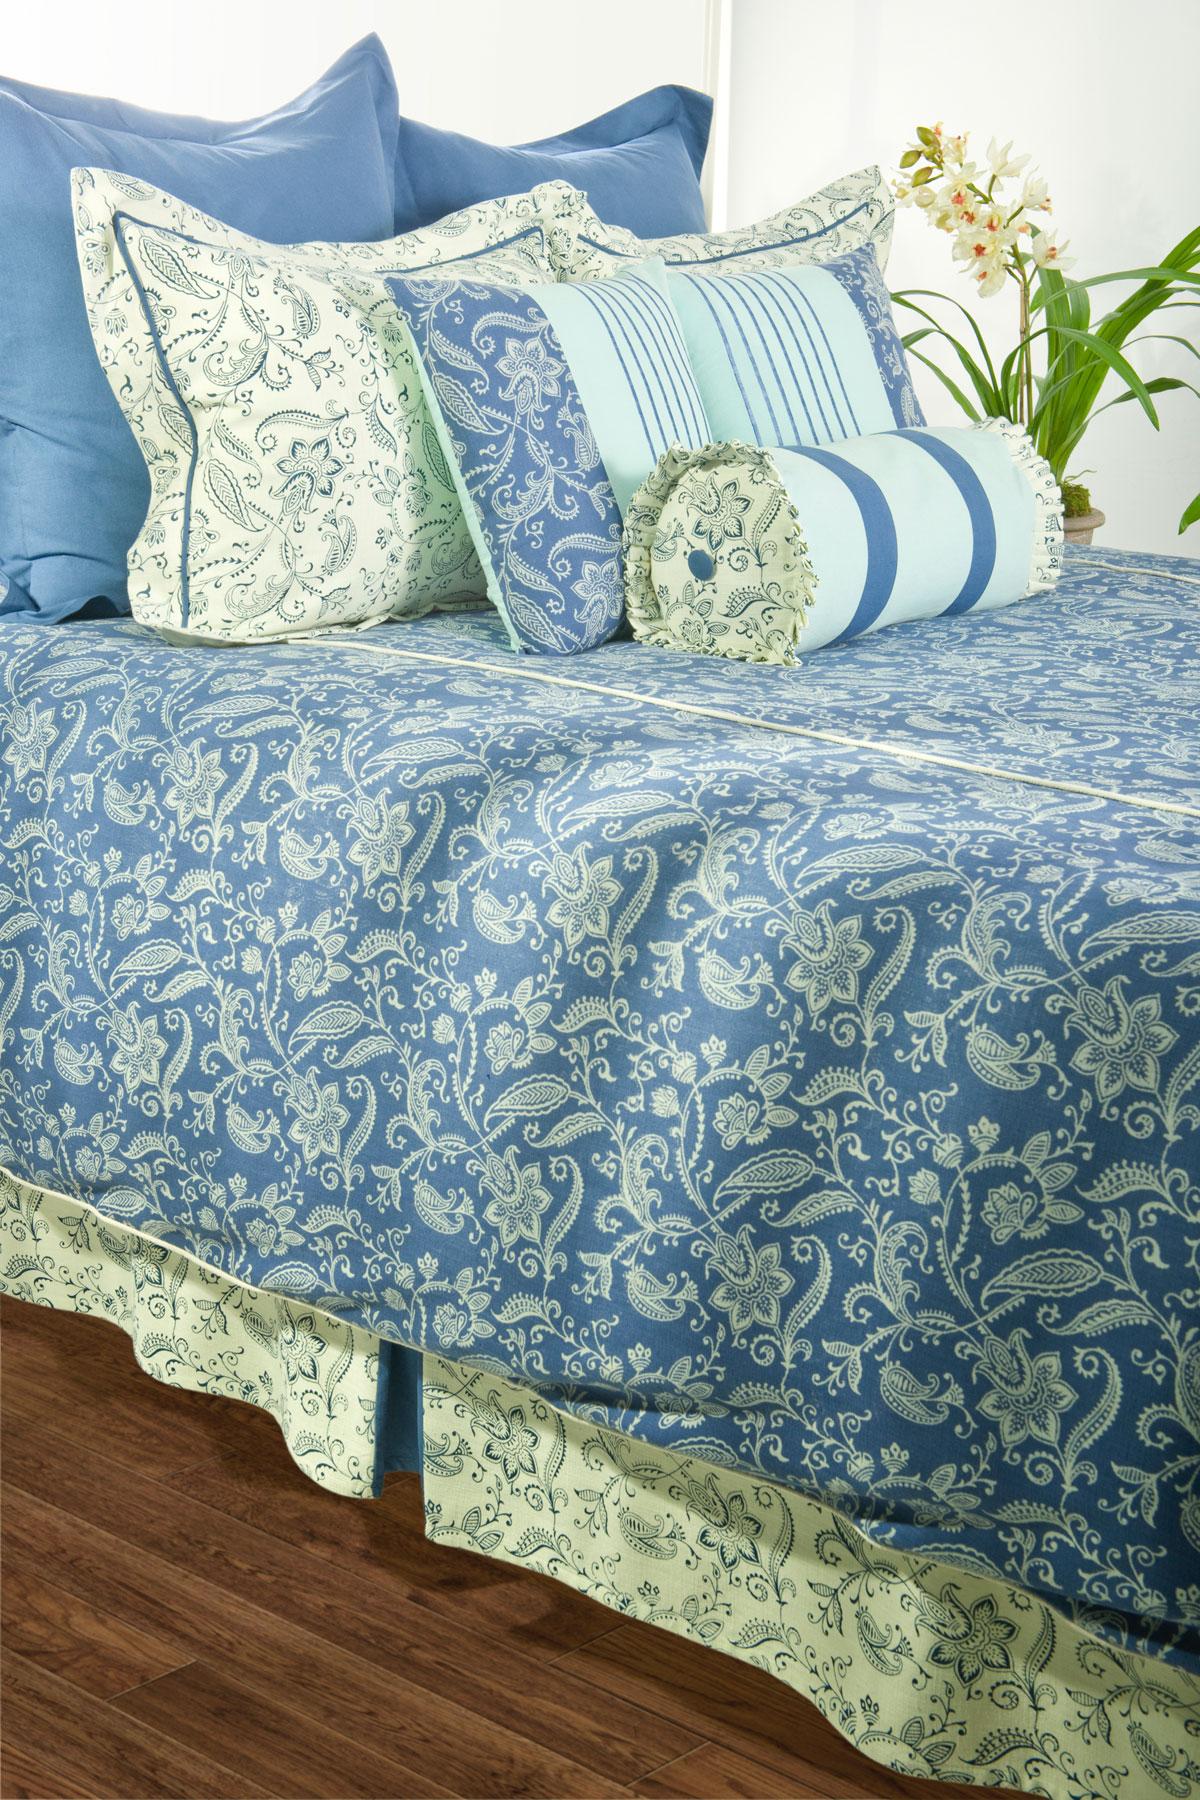 Indigo Bb By Rizzy Home Bedding Beddingsuperstore Com